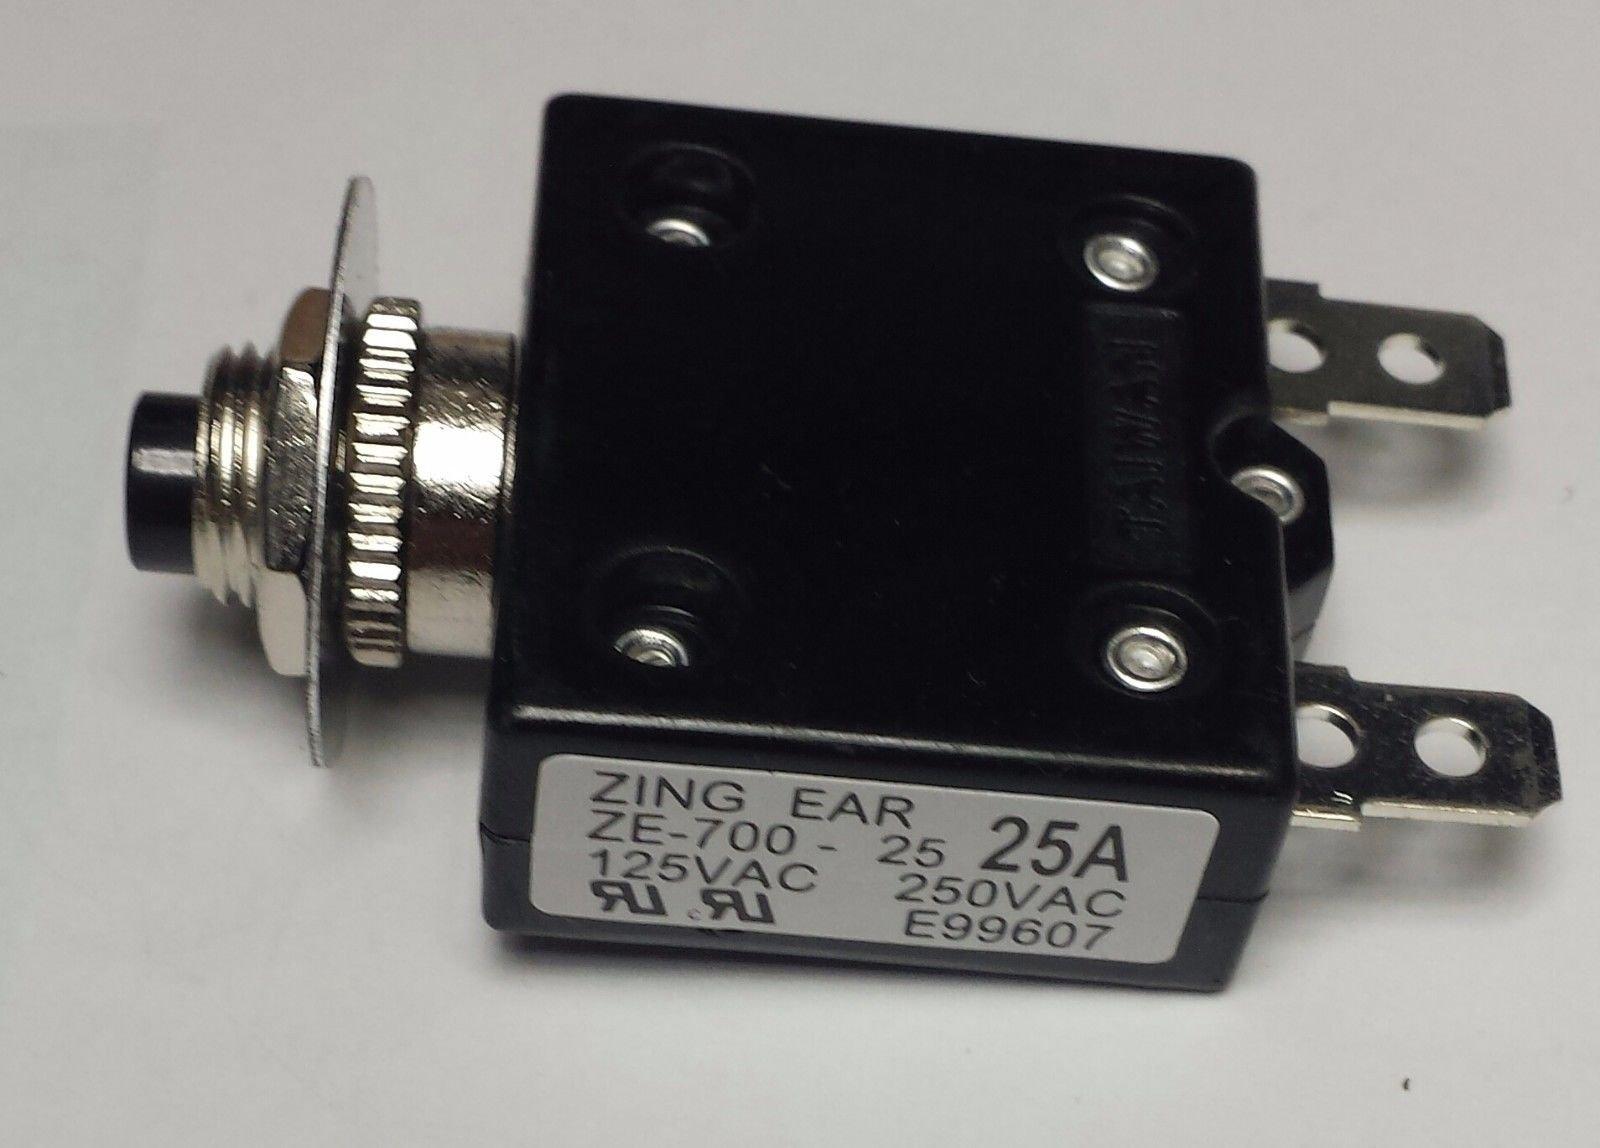 CBK Supply - ZE700-25A Zing Ear thermal circuit breaker replaces Carling, Joemex, Kuoyeh, P&B